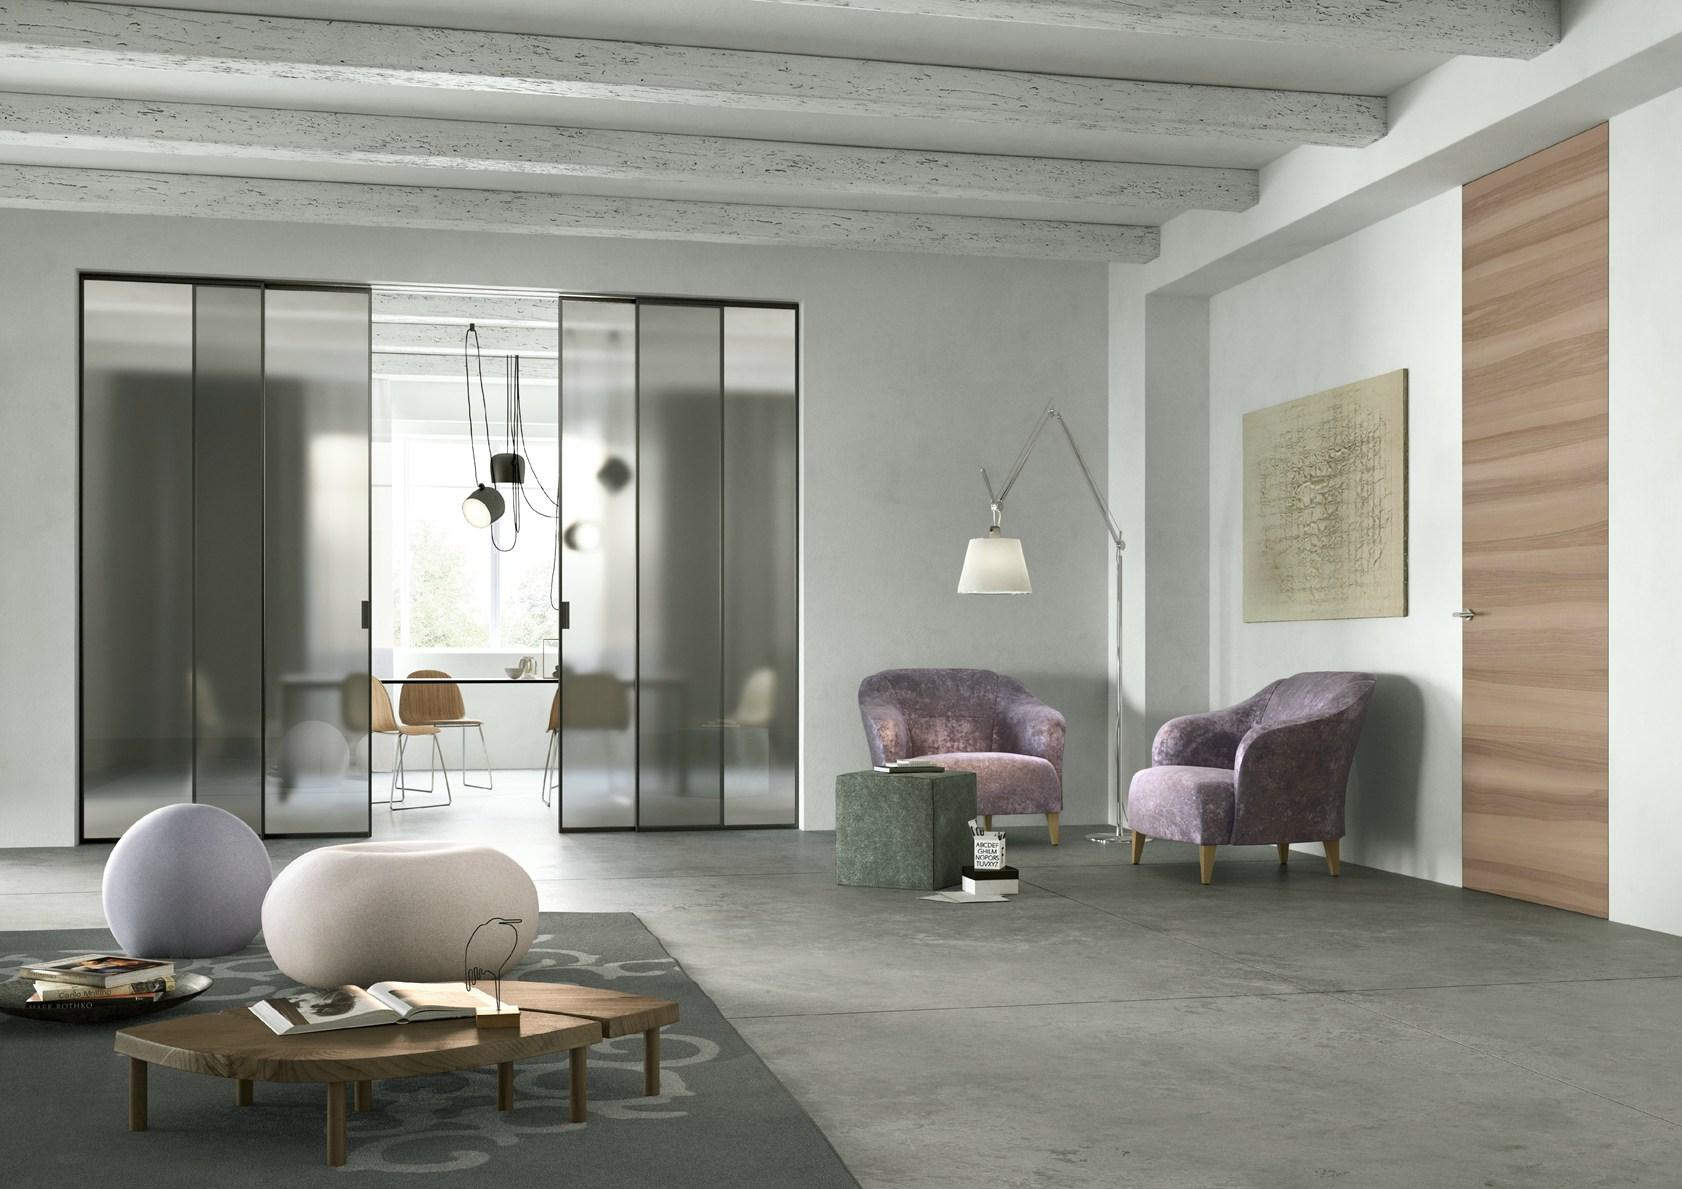 Pareti divisorie mobili per abitazioni prezzi pareti - Pareti divisorie mobili per abitazioni ...